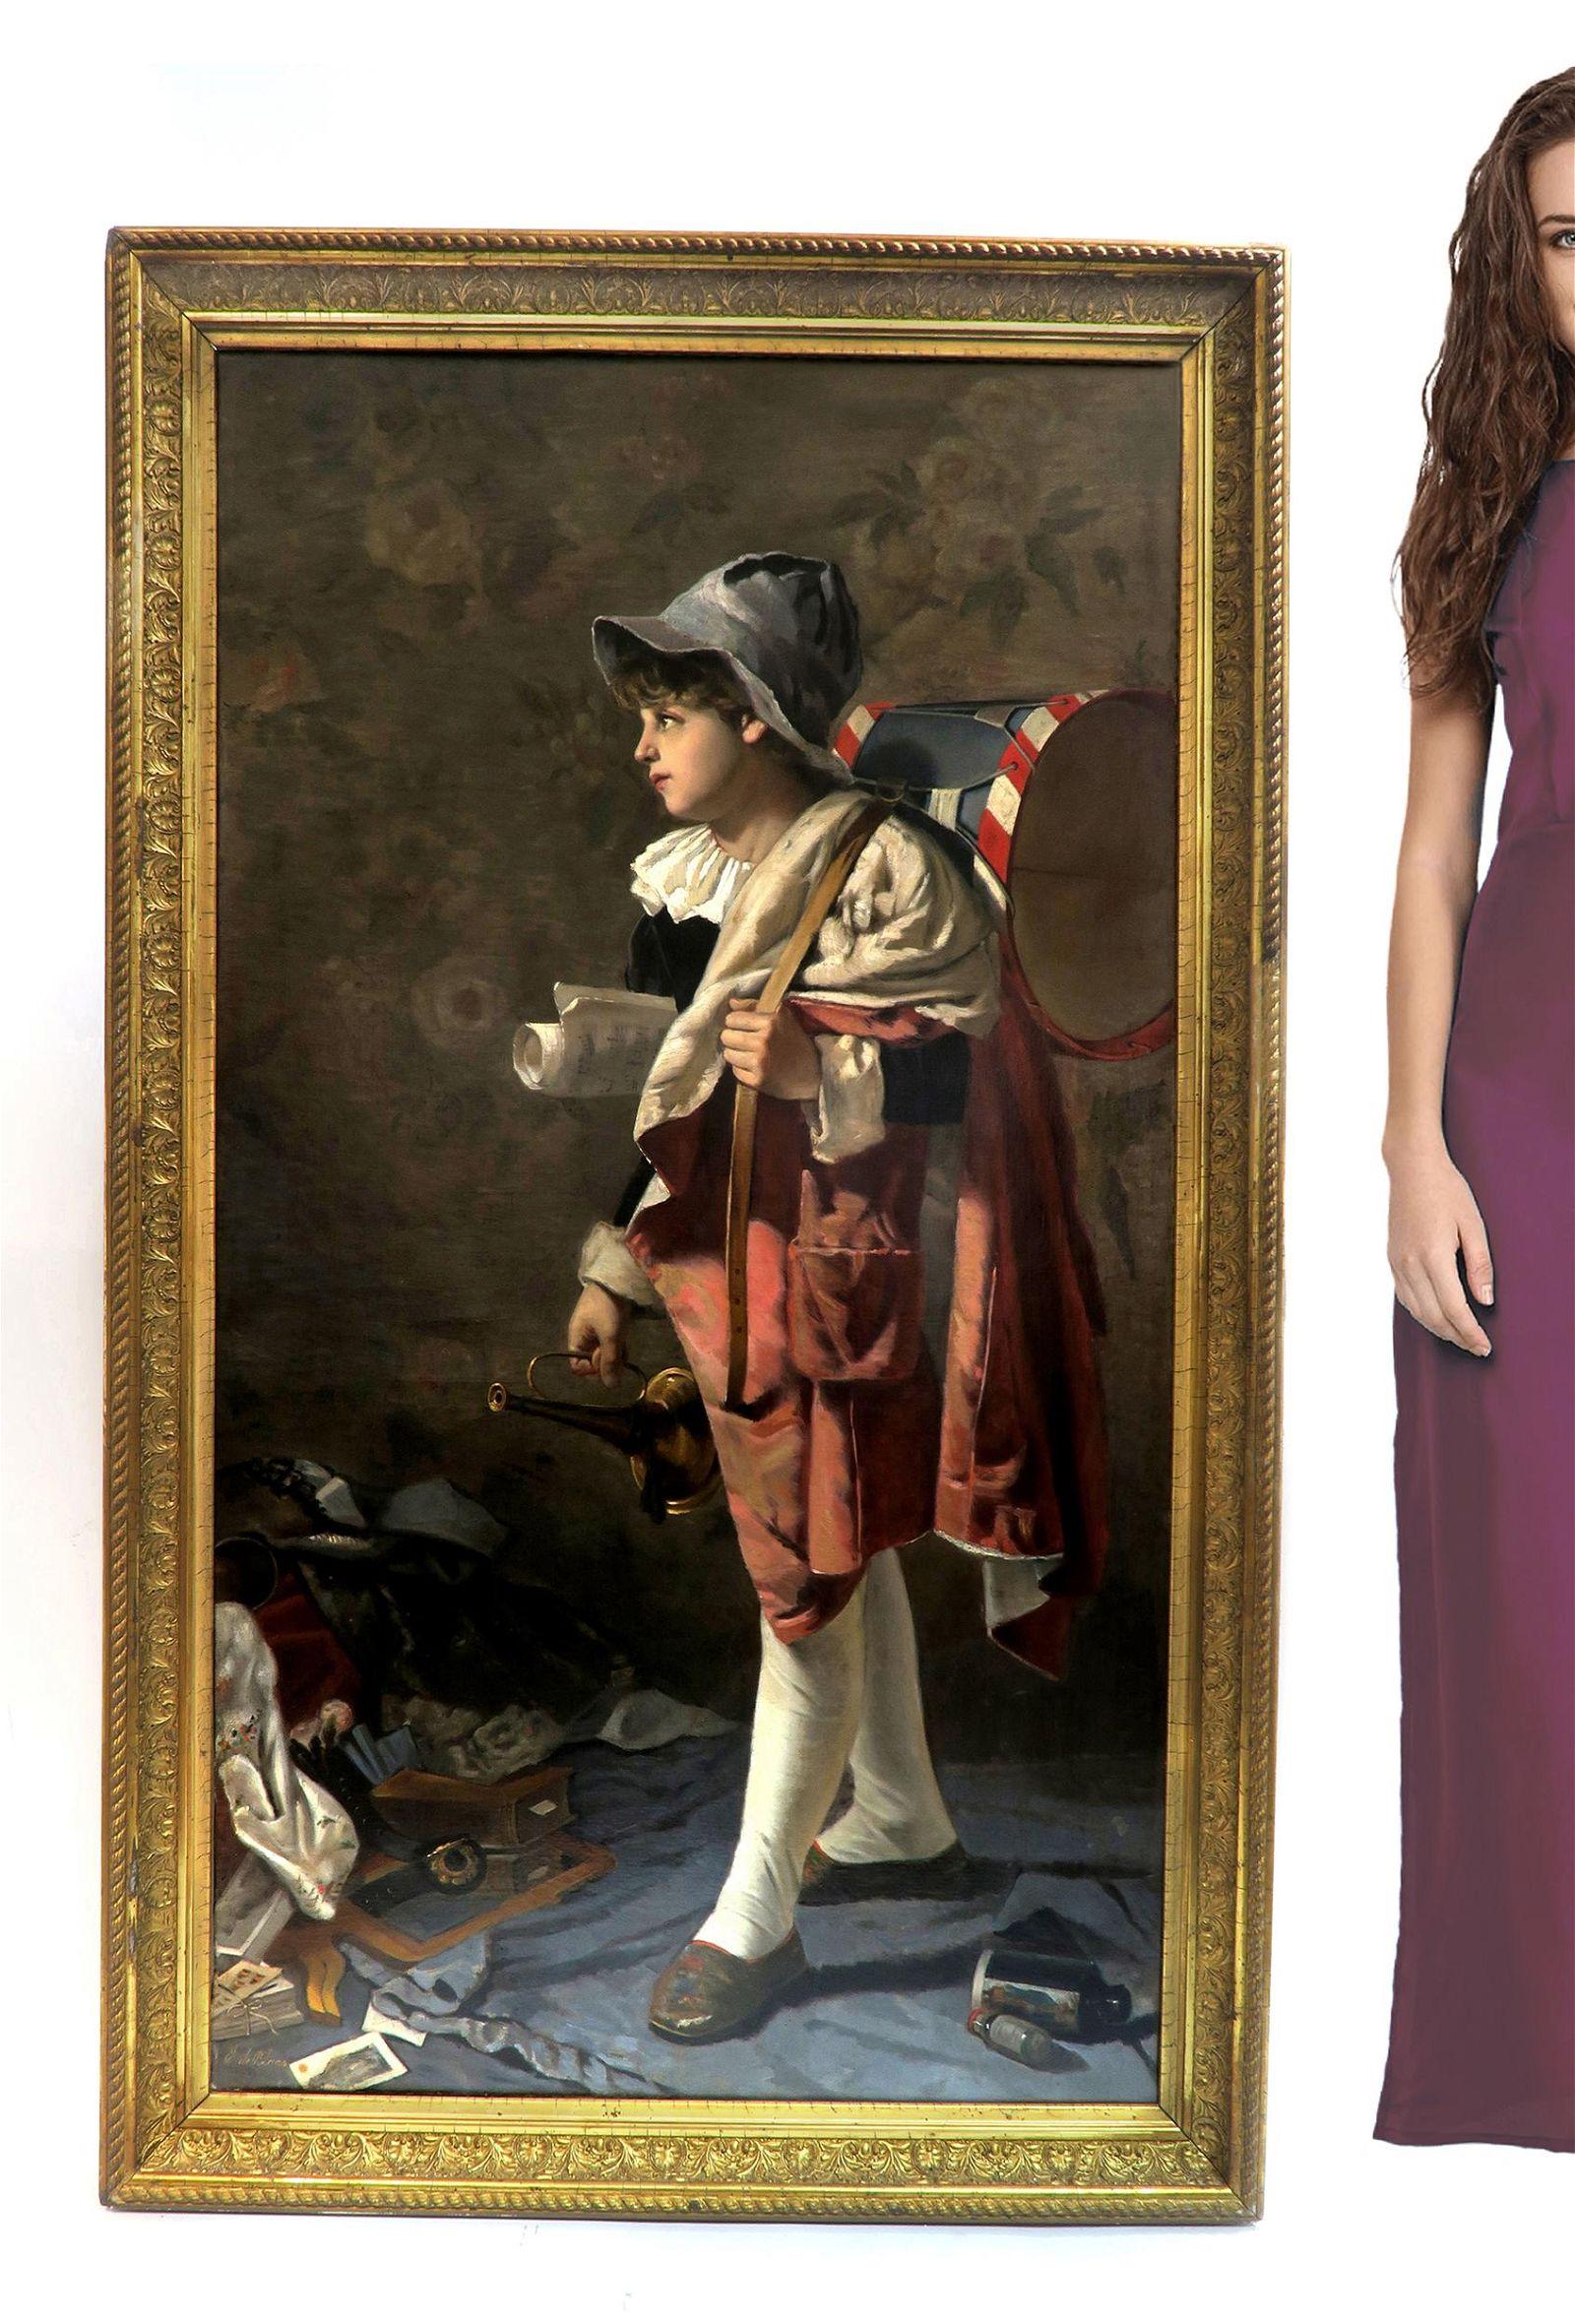 Eugene de Blaas (Austrian, 1843-1931) Oil on Canvas